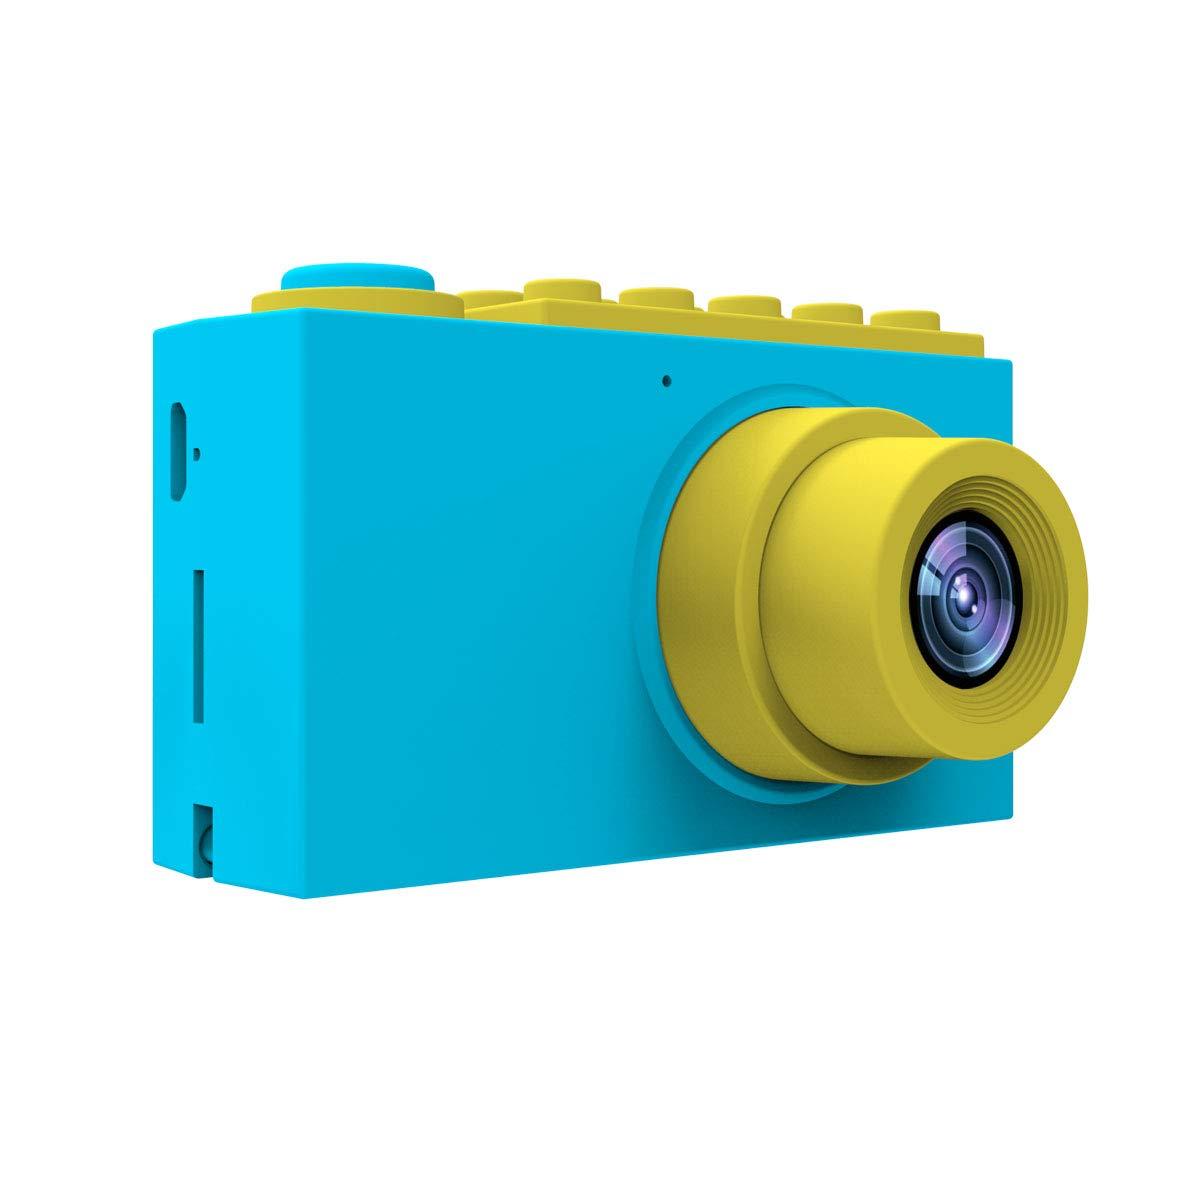 MAGENDARA Kids Digital Camera HD 1080P Children Camera 2.0 Inch Screen Toy Camera Boys Girls Birthday, Blue